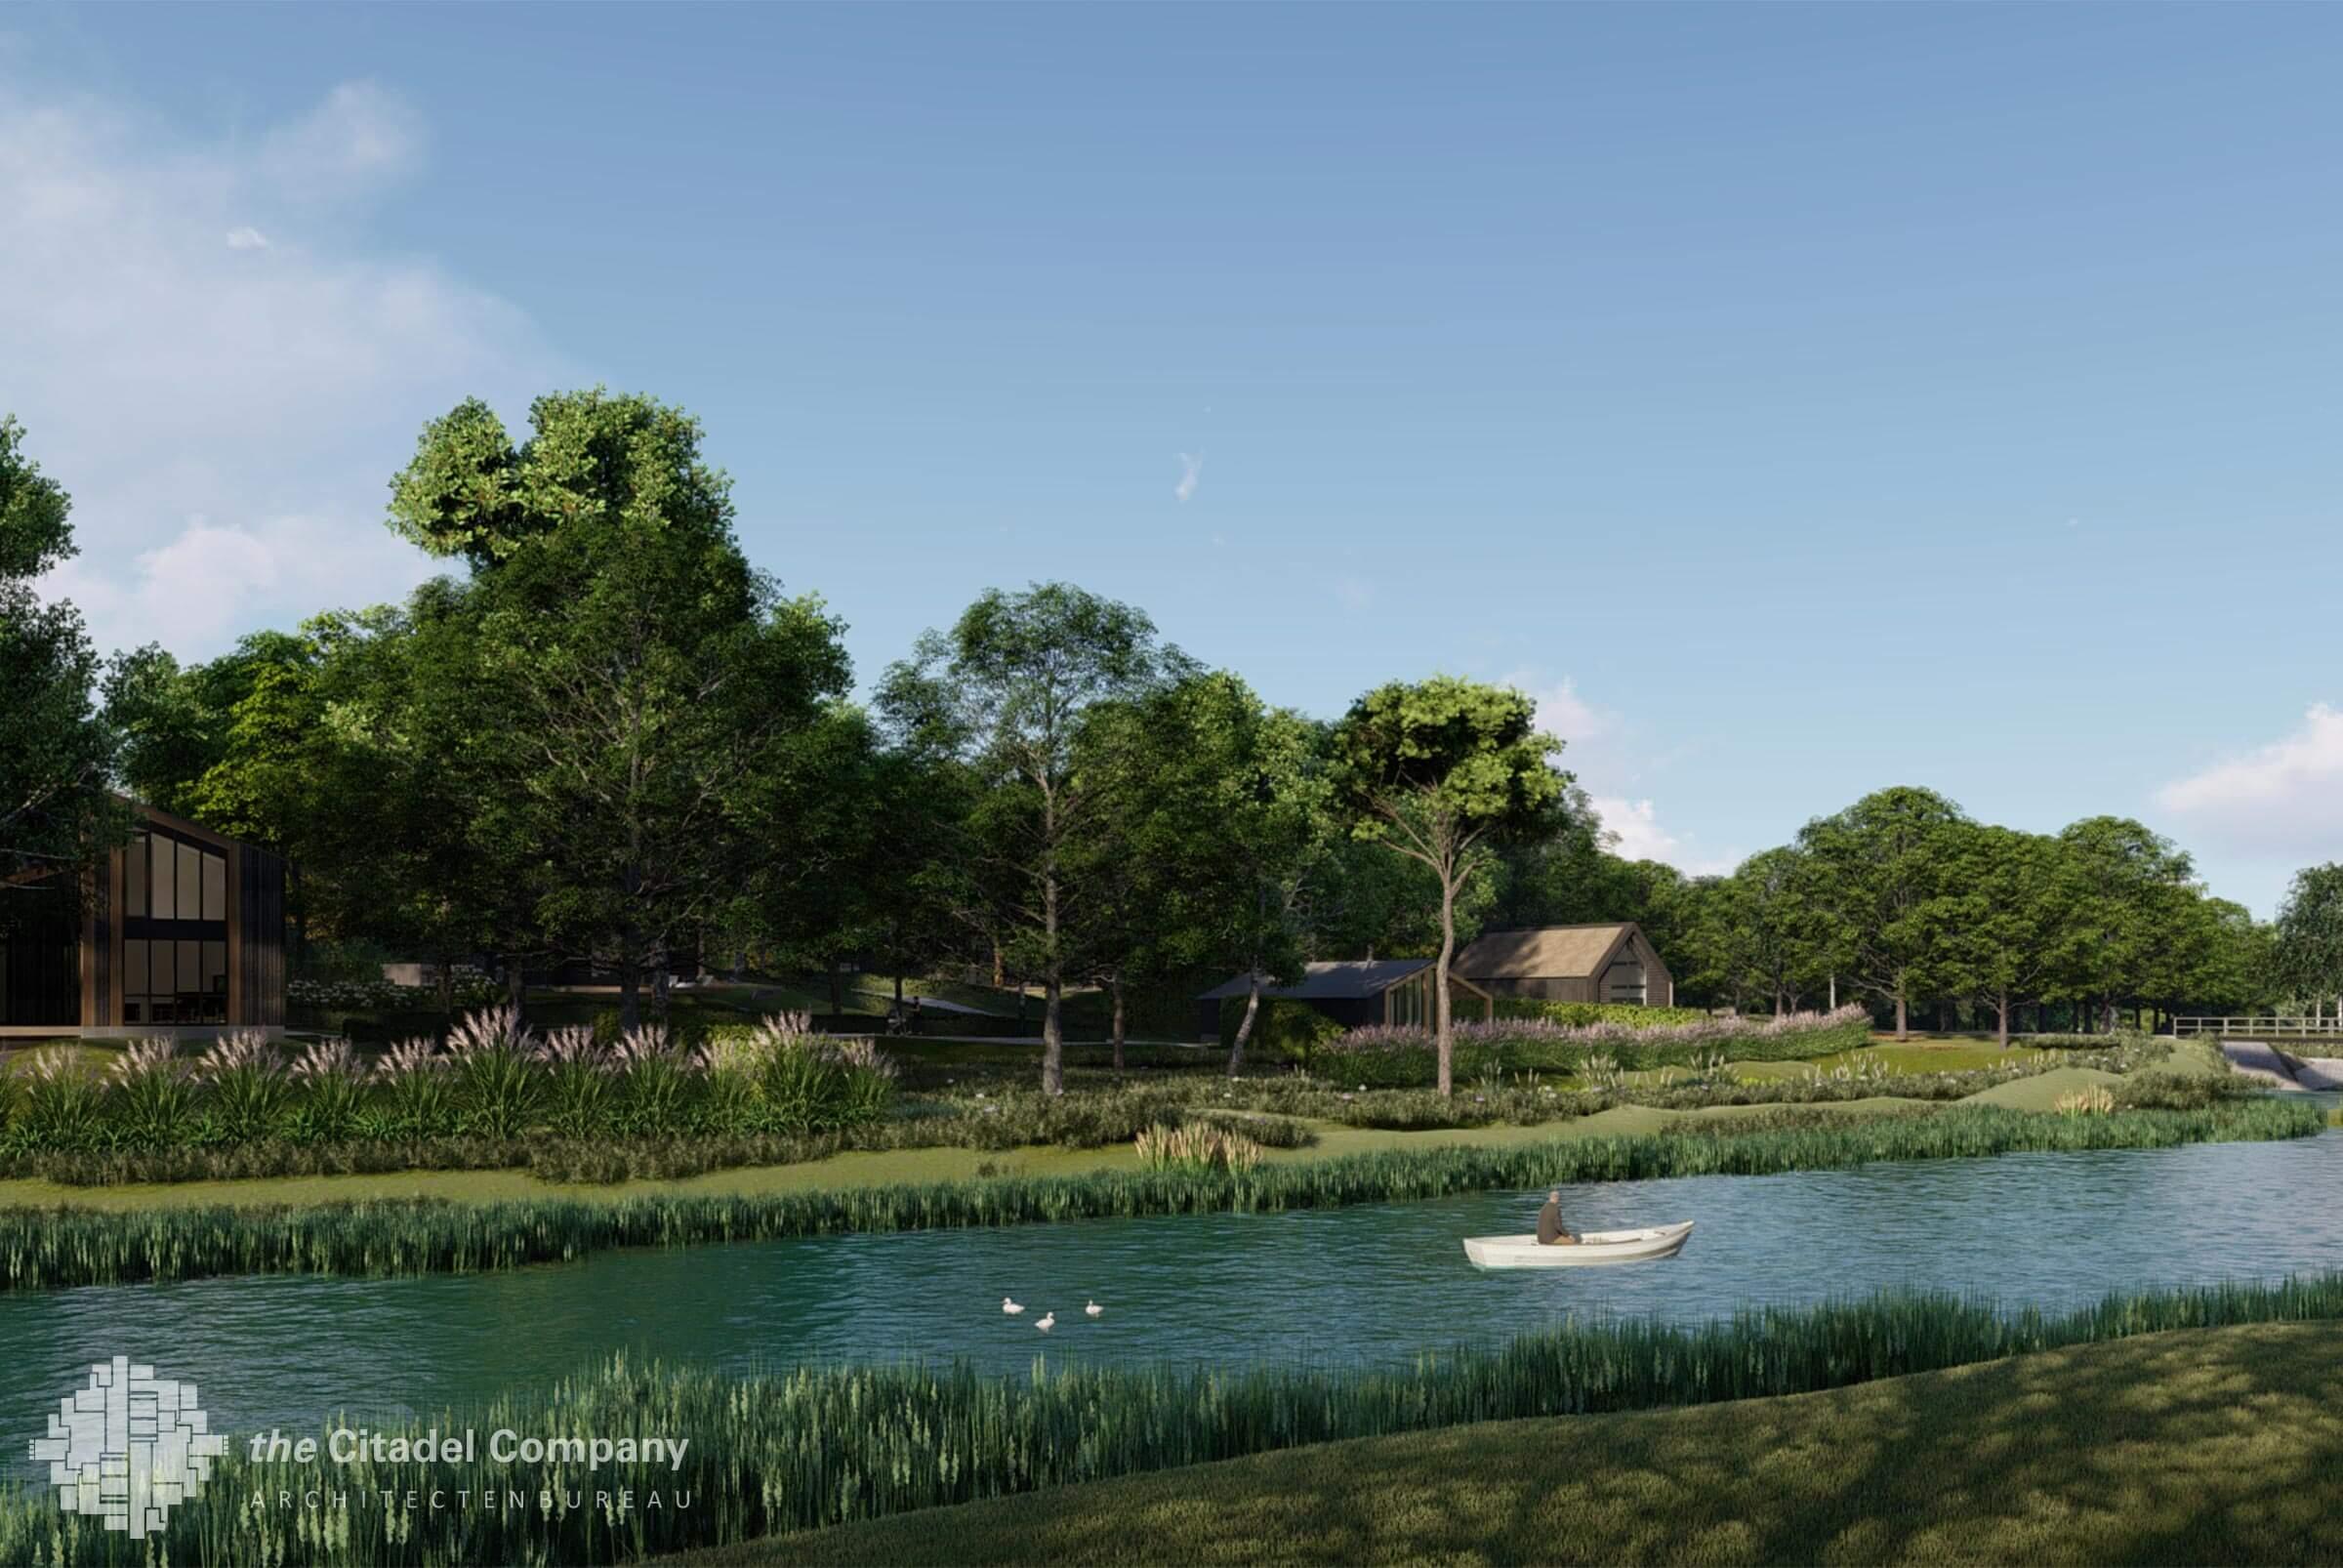 Herontwikkeling Park 't Holt, Dalfsen